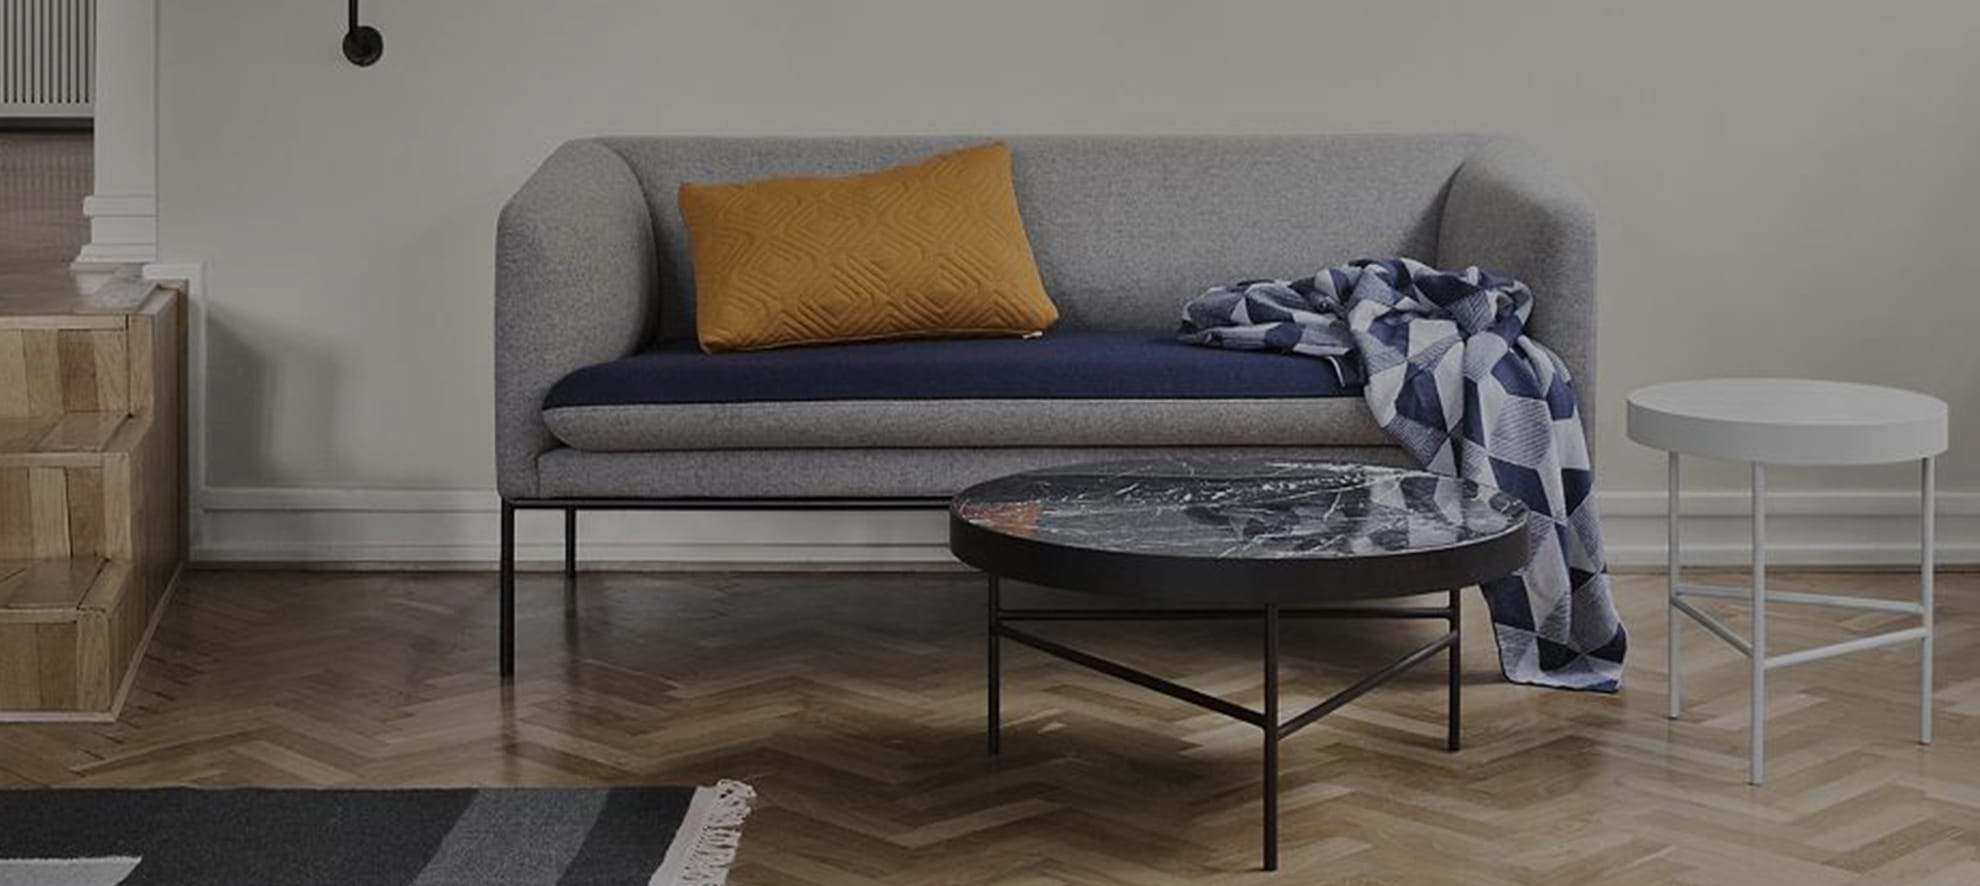 Design Inspiration for Every Room.